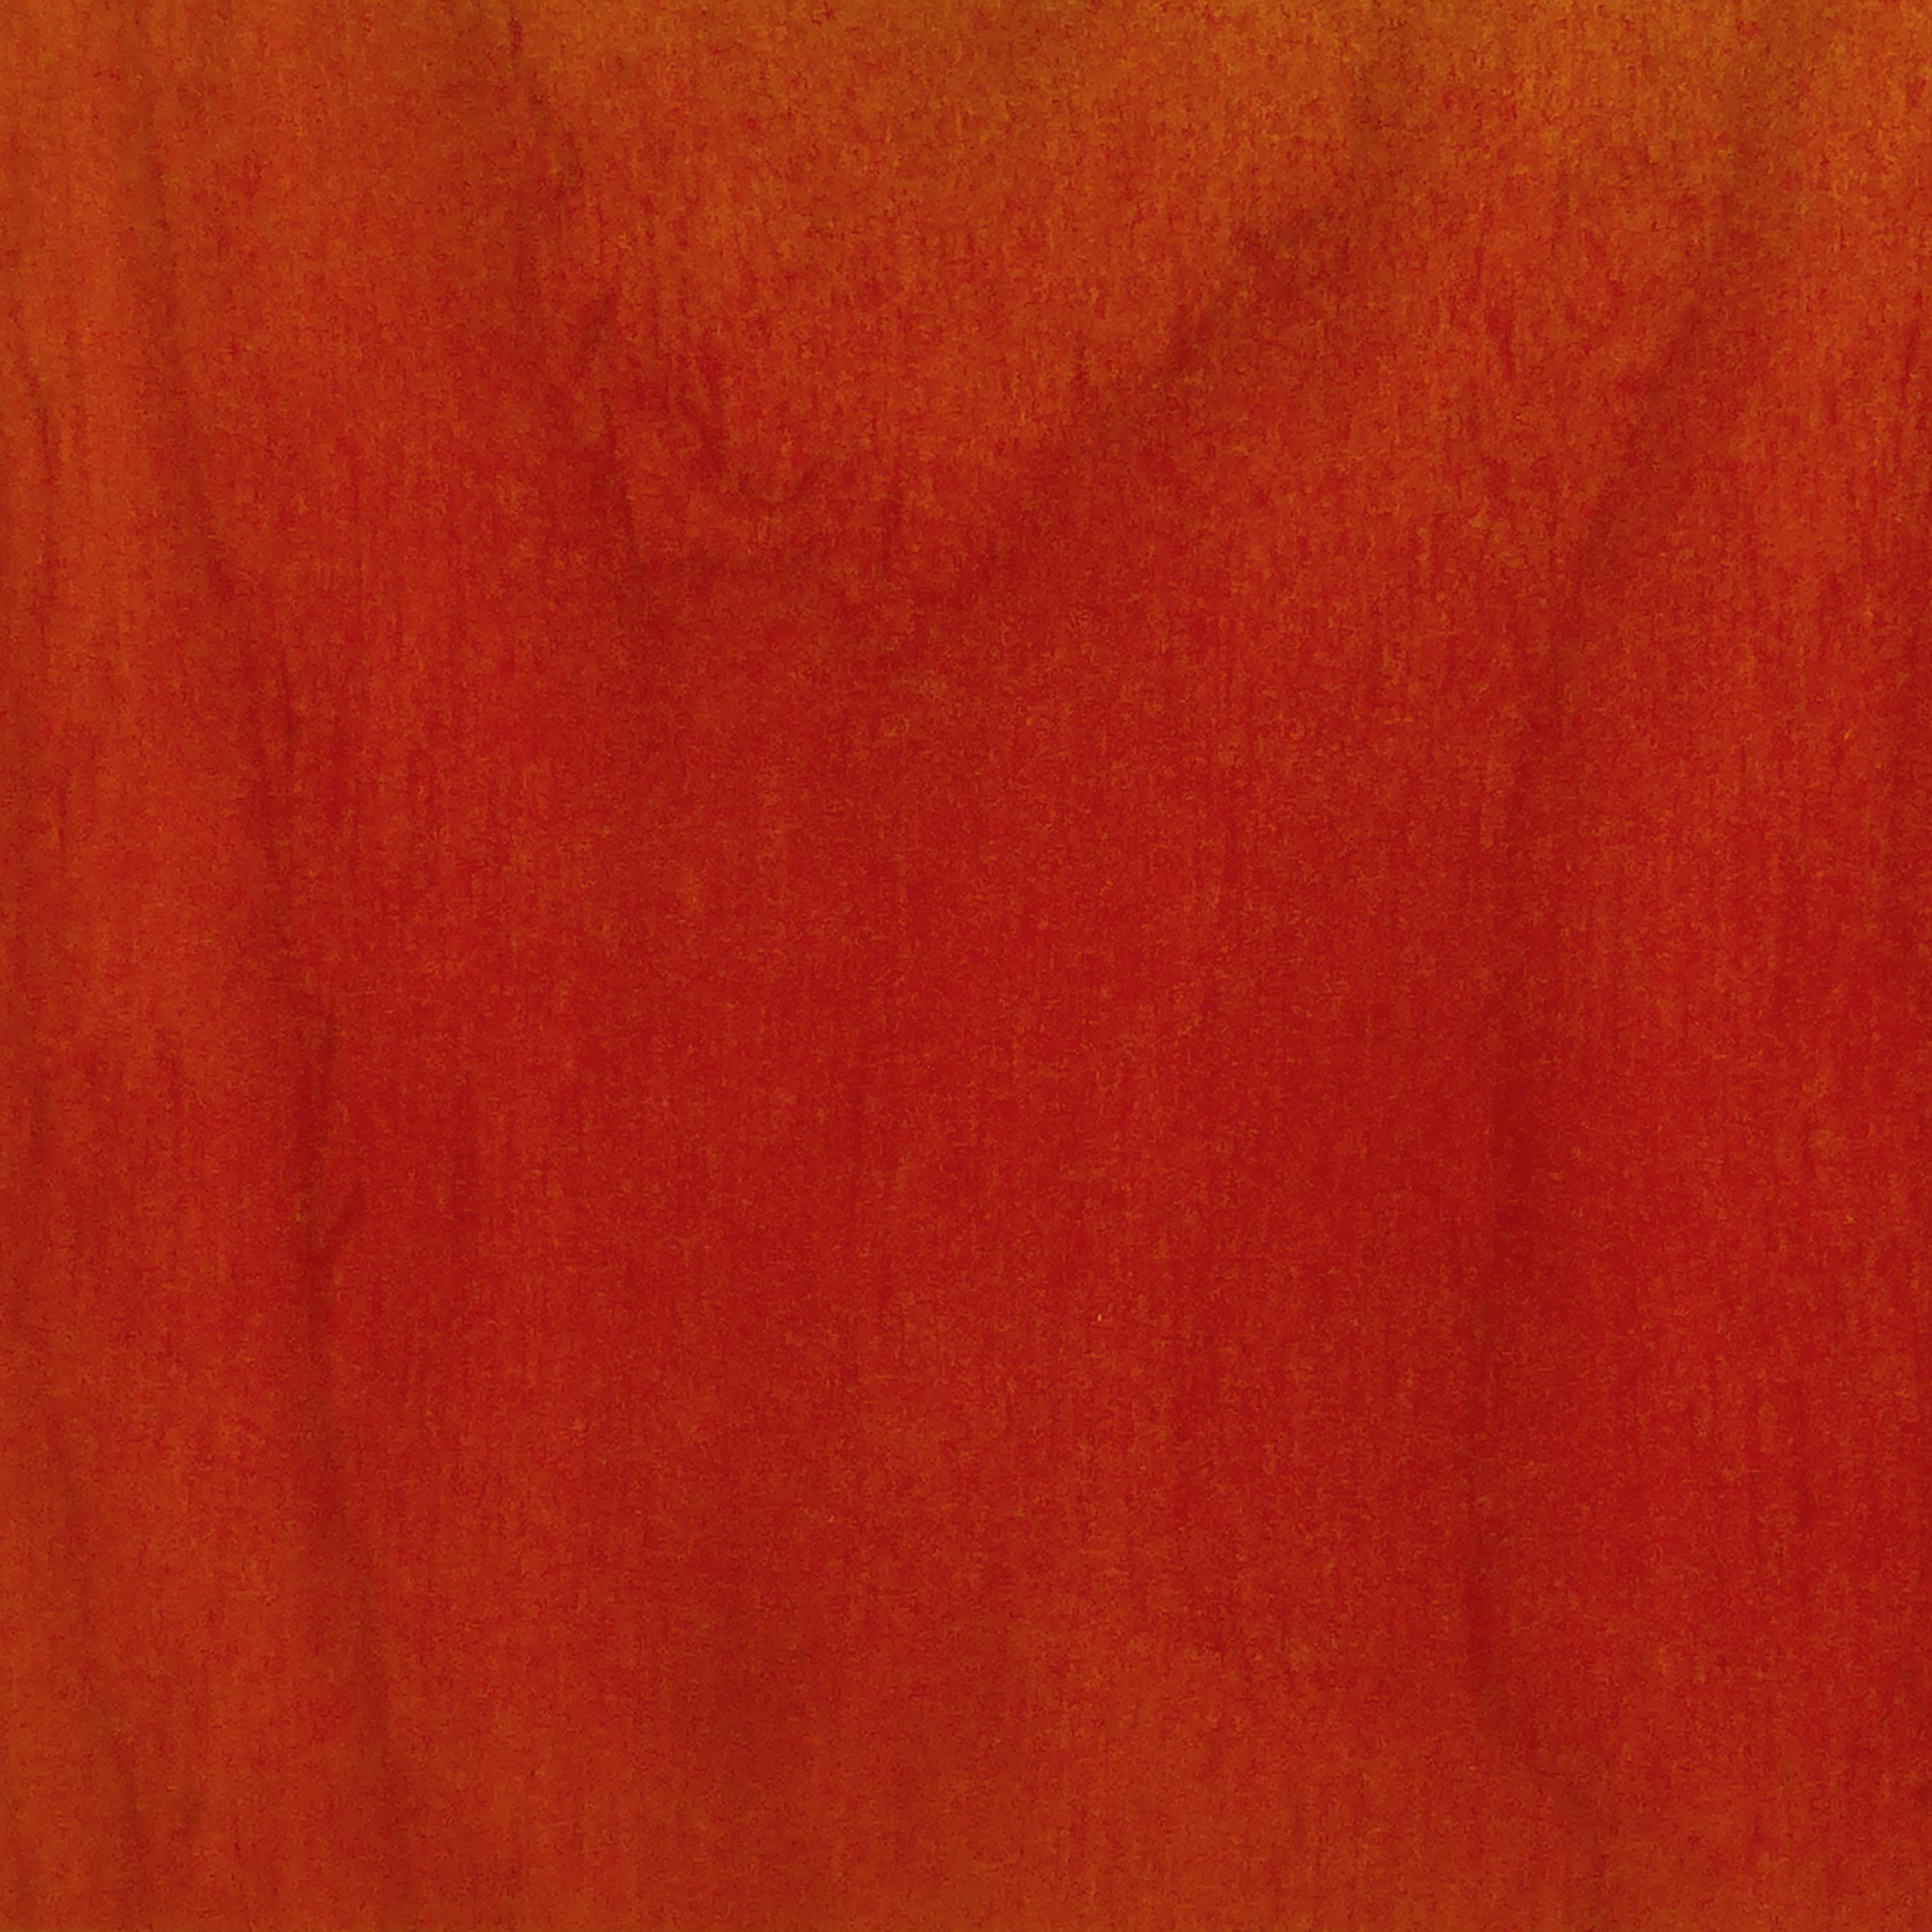 Orange, Light